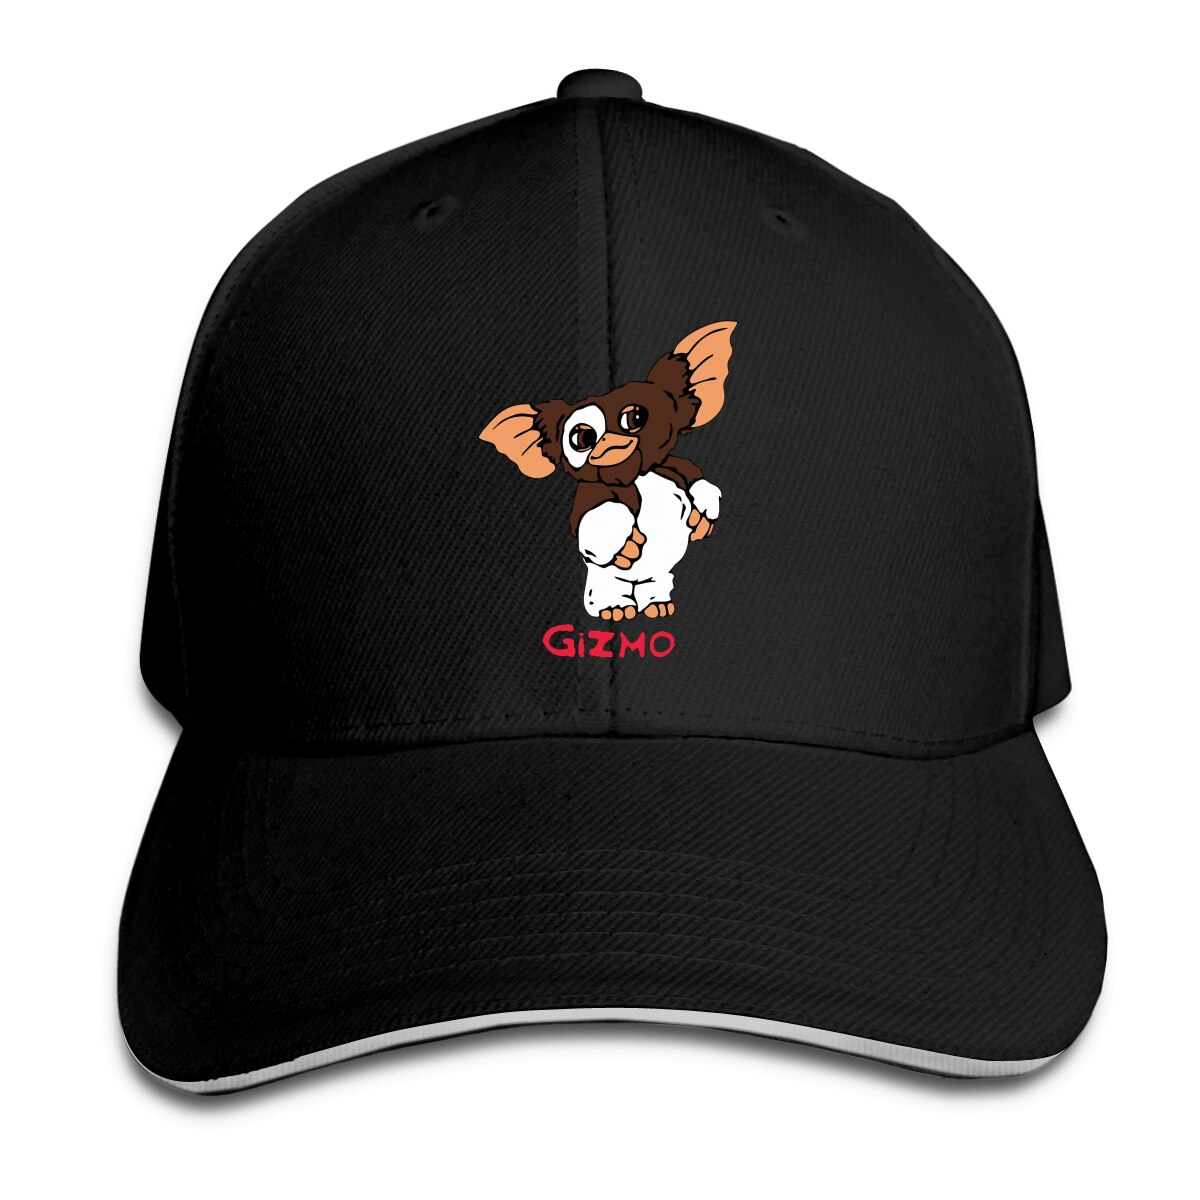 Gizmo Slim Peaked Cap Cotton Cap  Snapback Hat Summer Cap Hip Hop Fitted Cap baby yoda star war Mandalorian Coast Hats